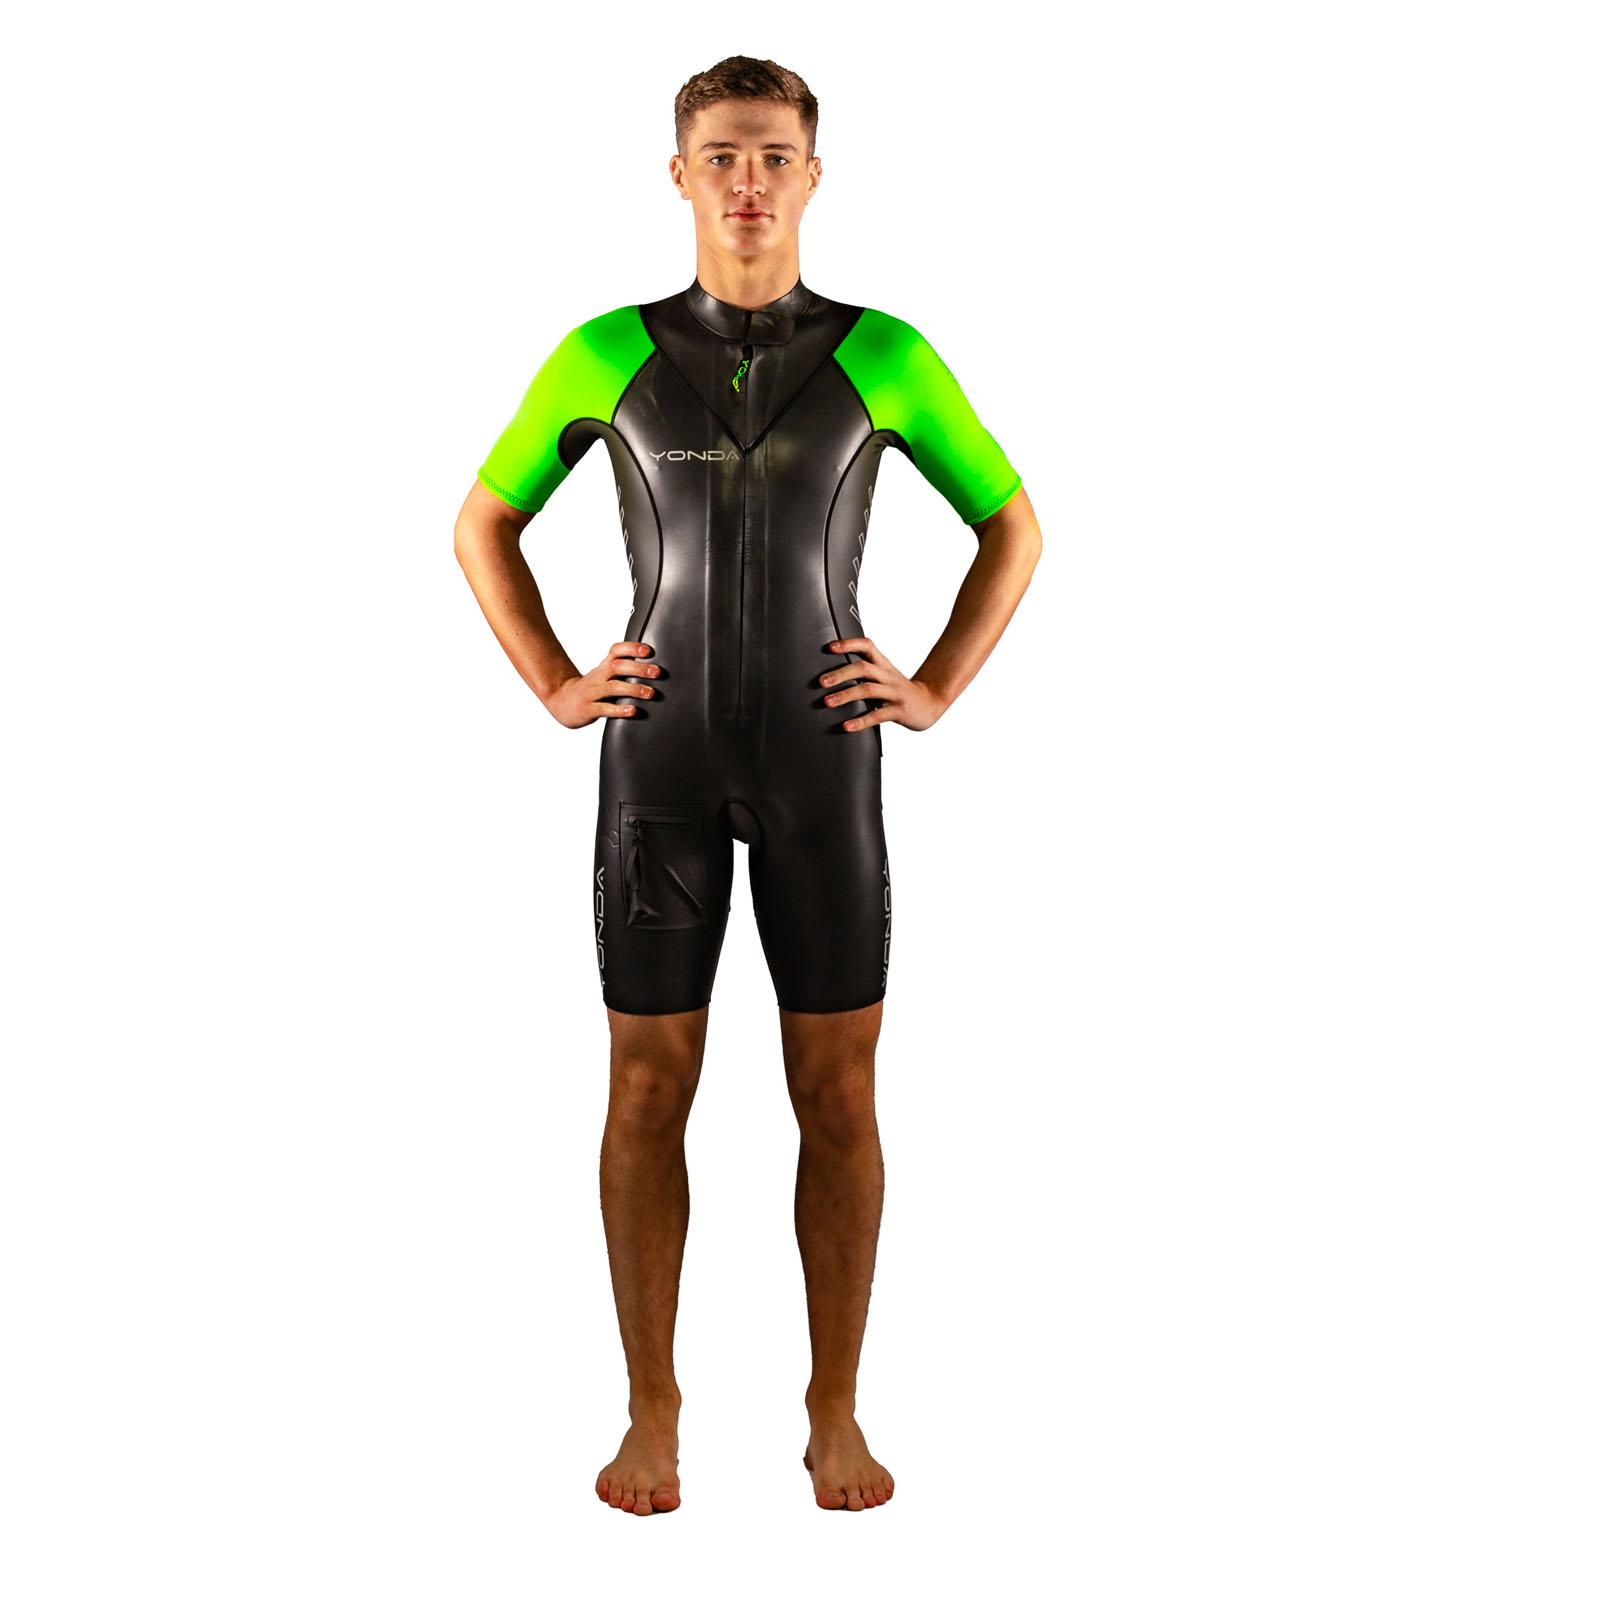 Yonda Spook Swim Run - Men's Wetsuit | Clearance